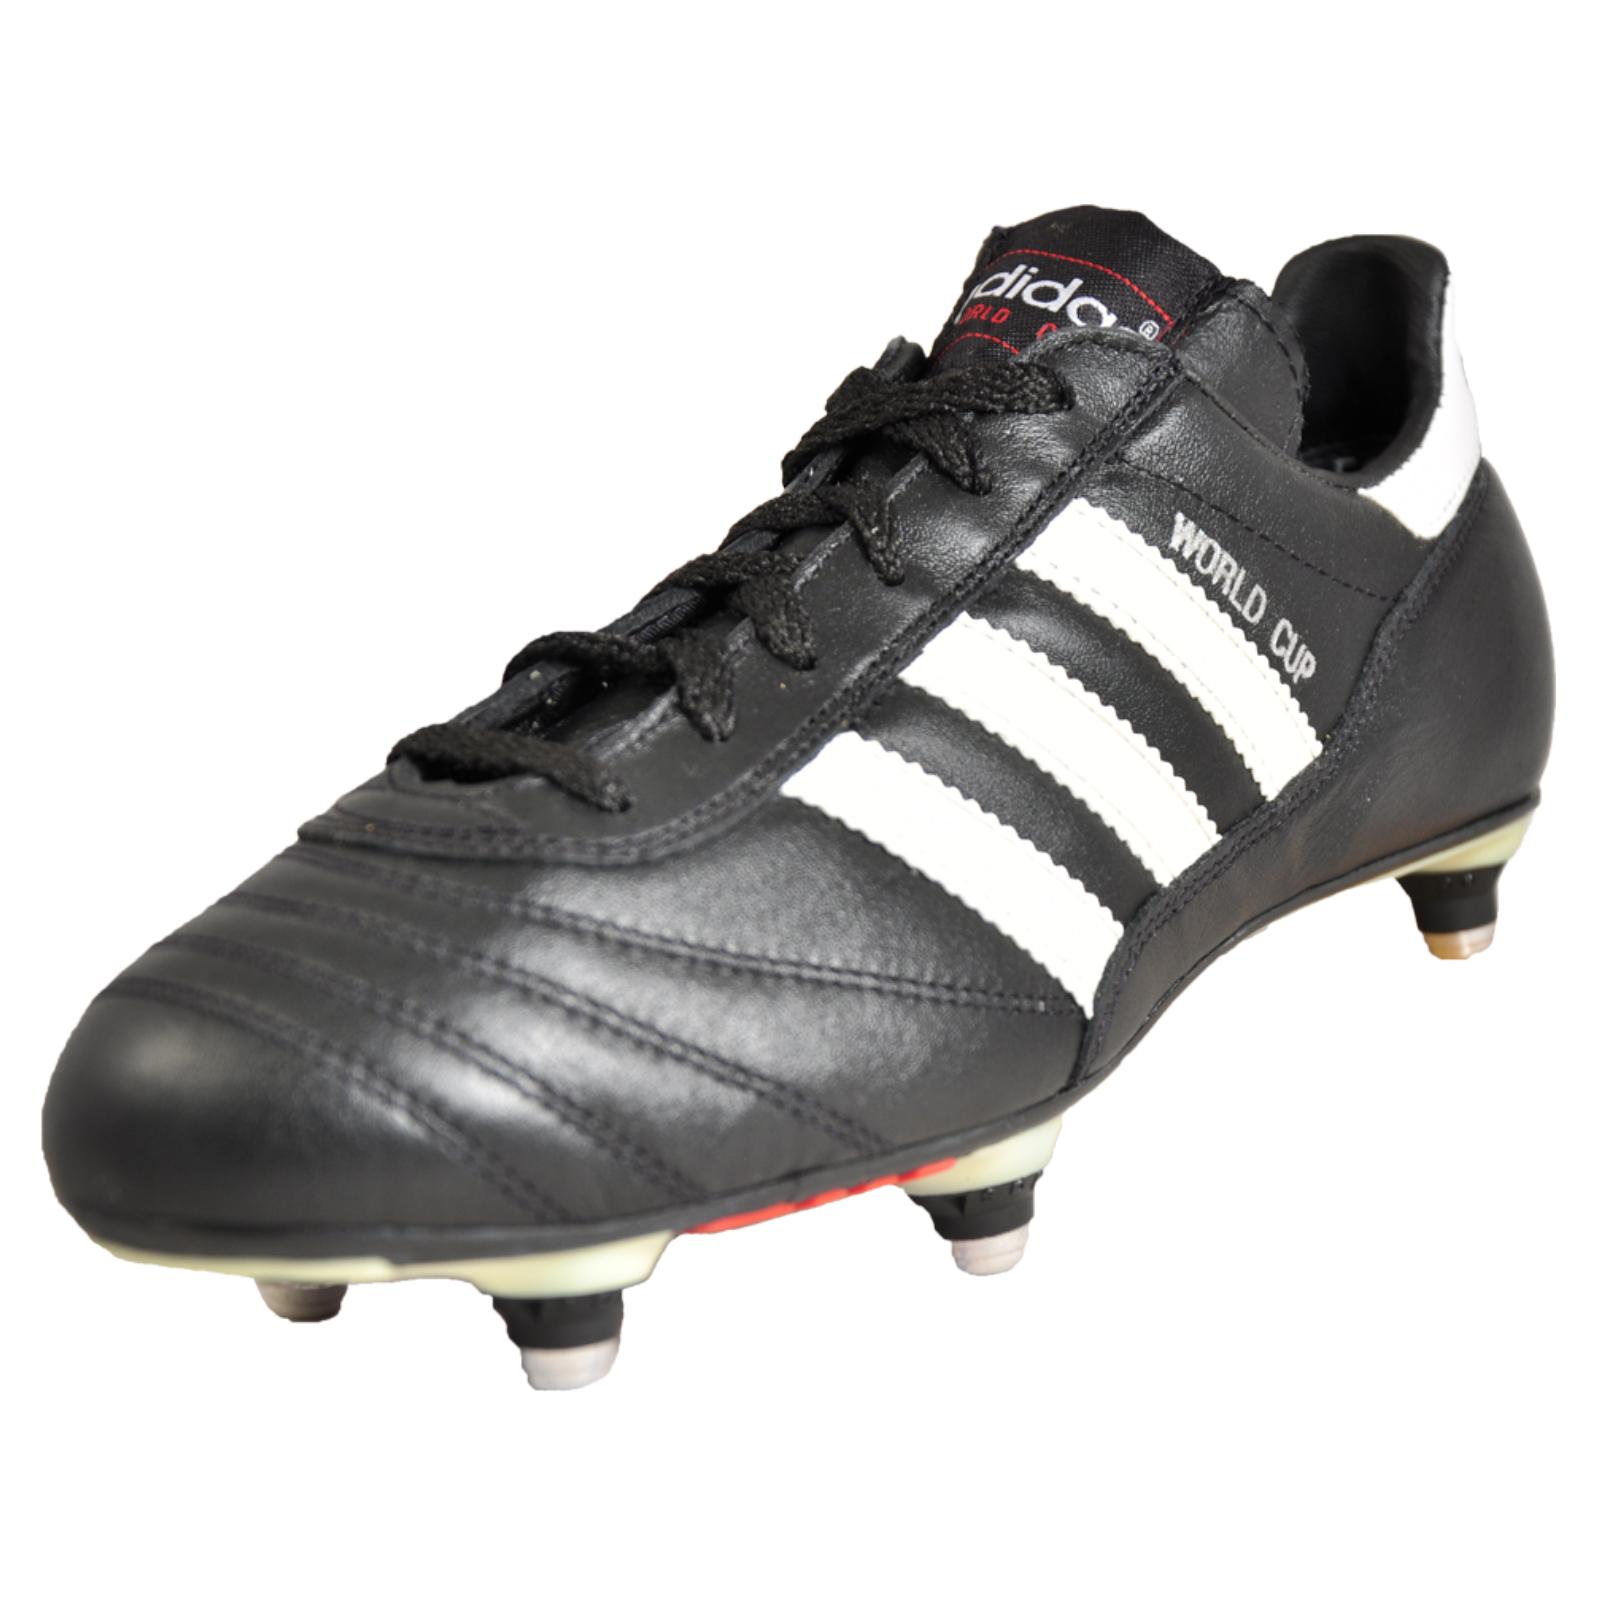 a2de9aa48a3 Adidas World Cup SG Men s Kids Boys Pro Leather Classic Premium Football  Boots Black